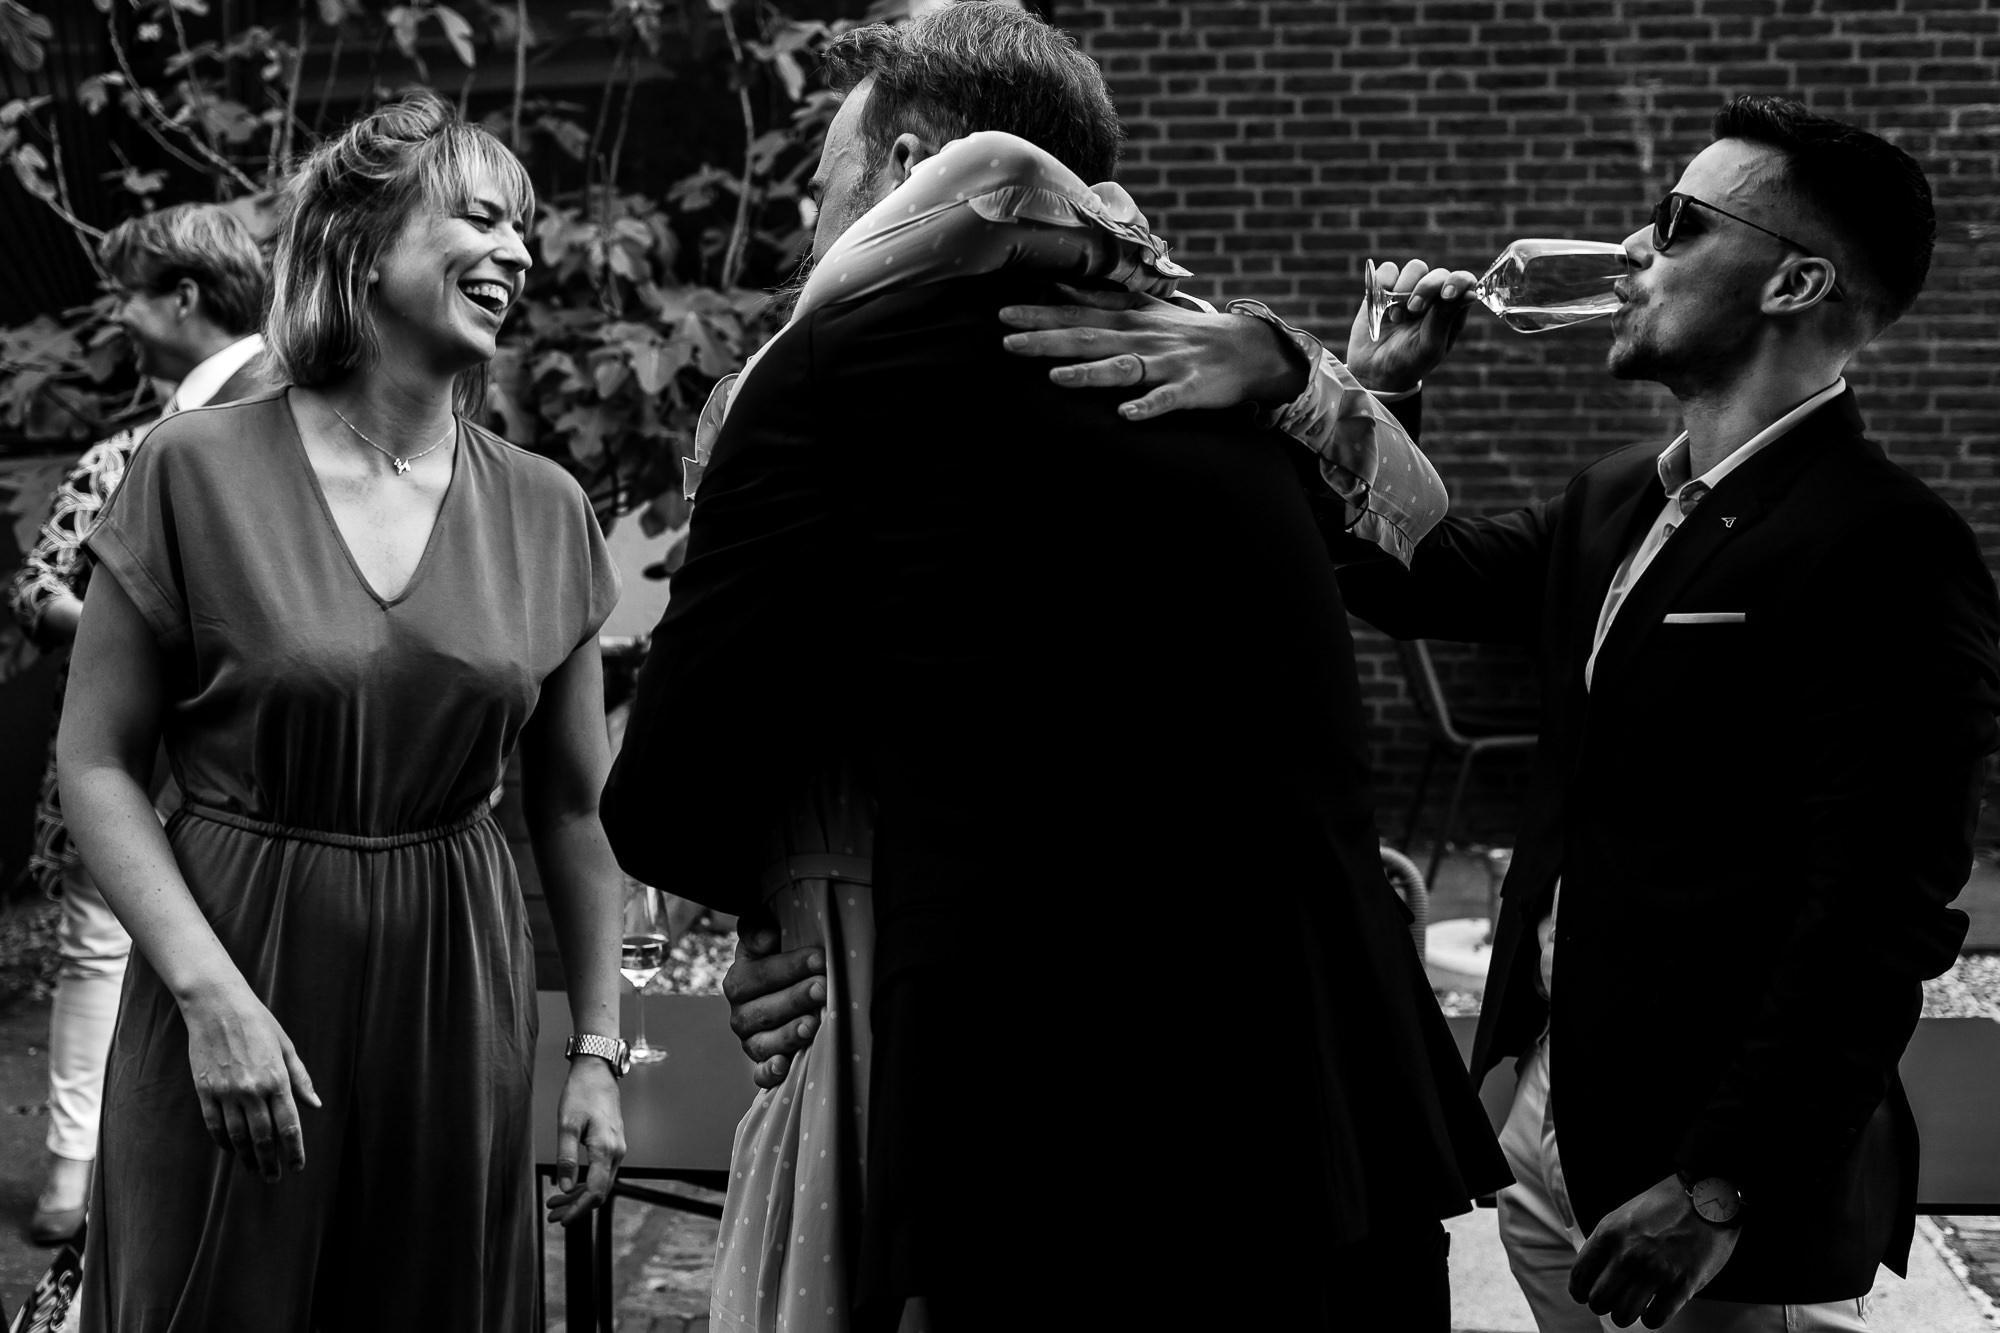 Zwart wit foto van mensen die elkaar omhelzen en man die champagne drinkt